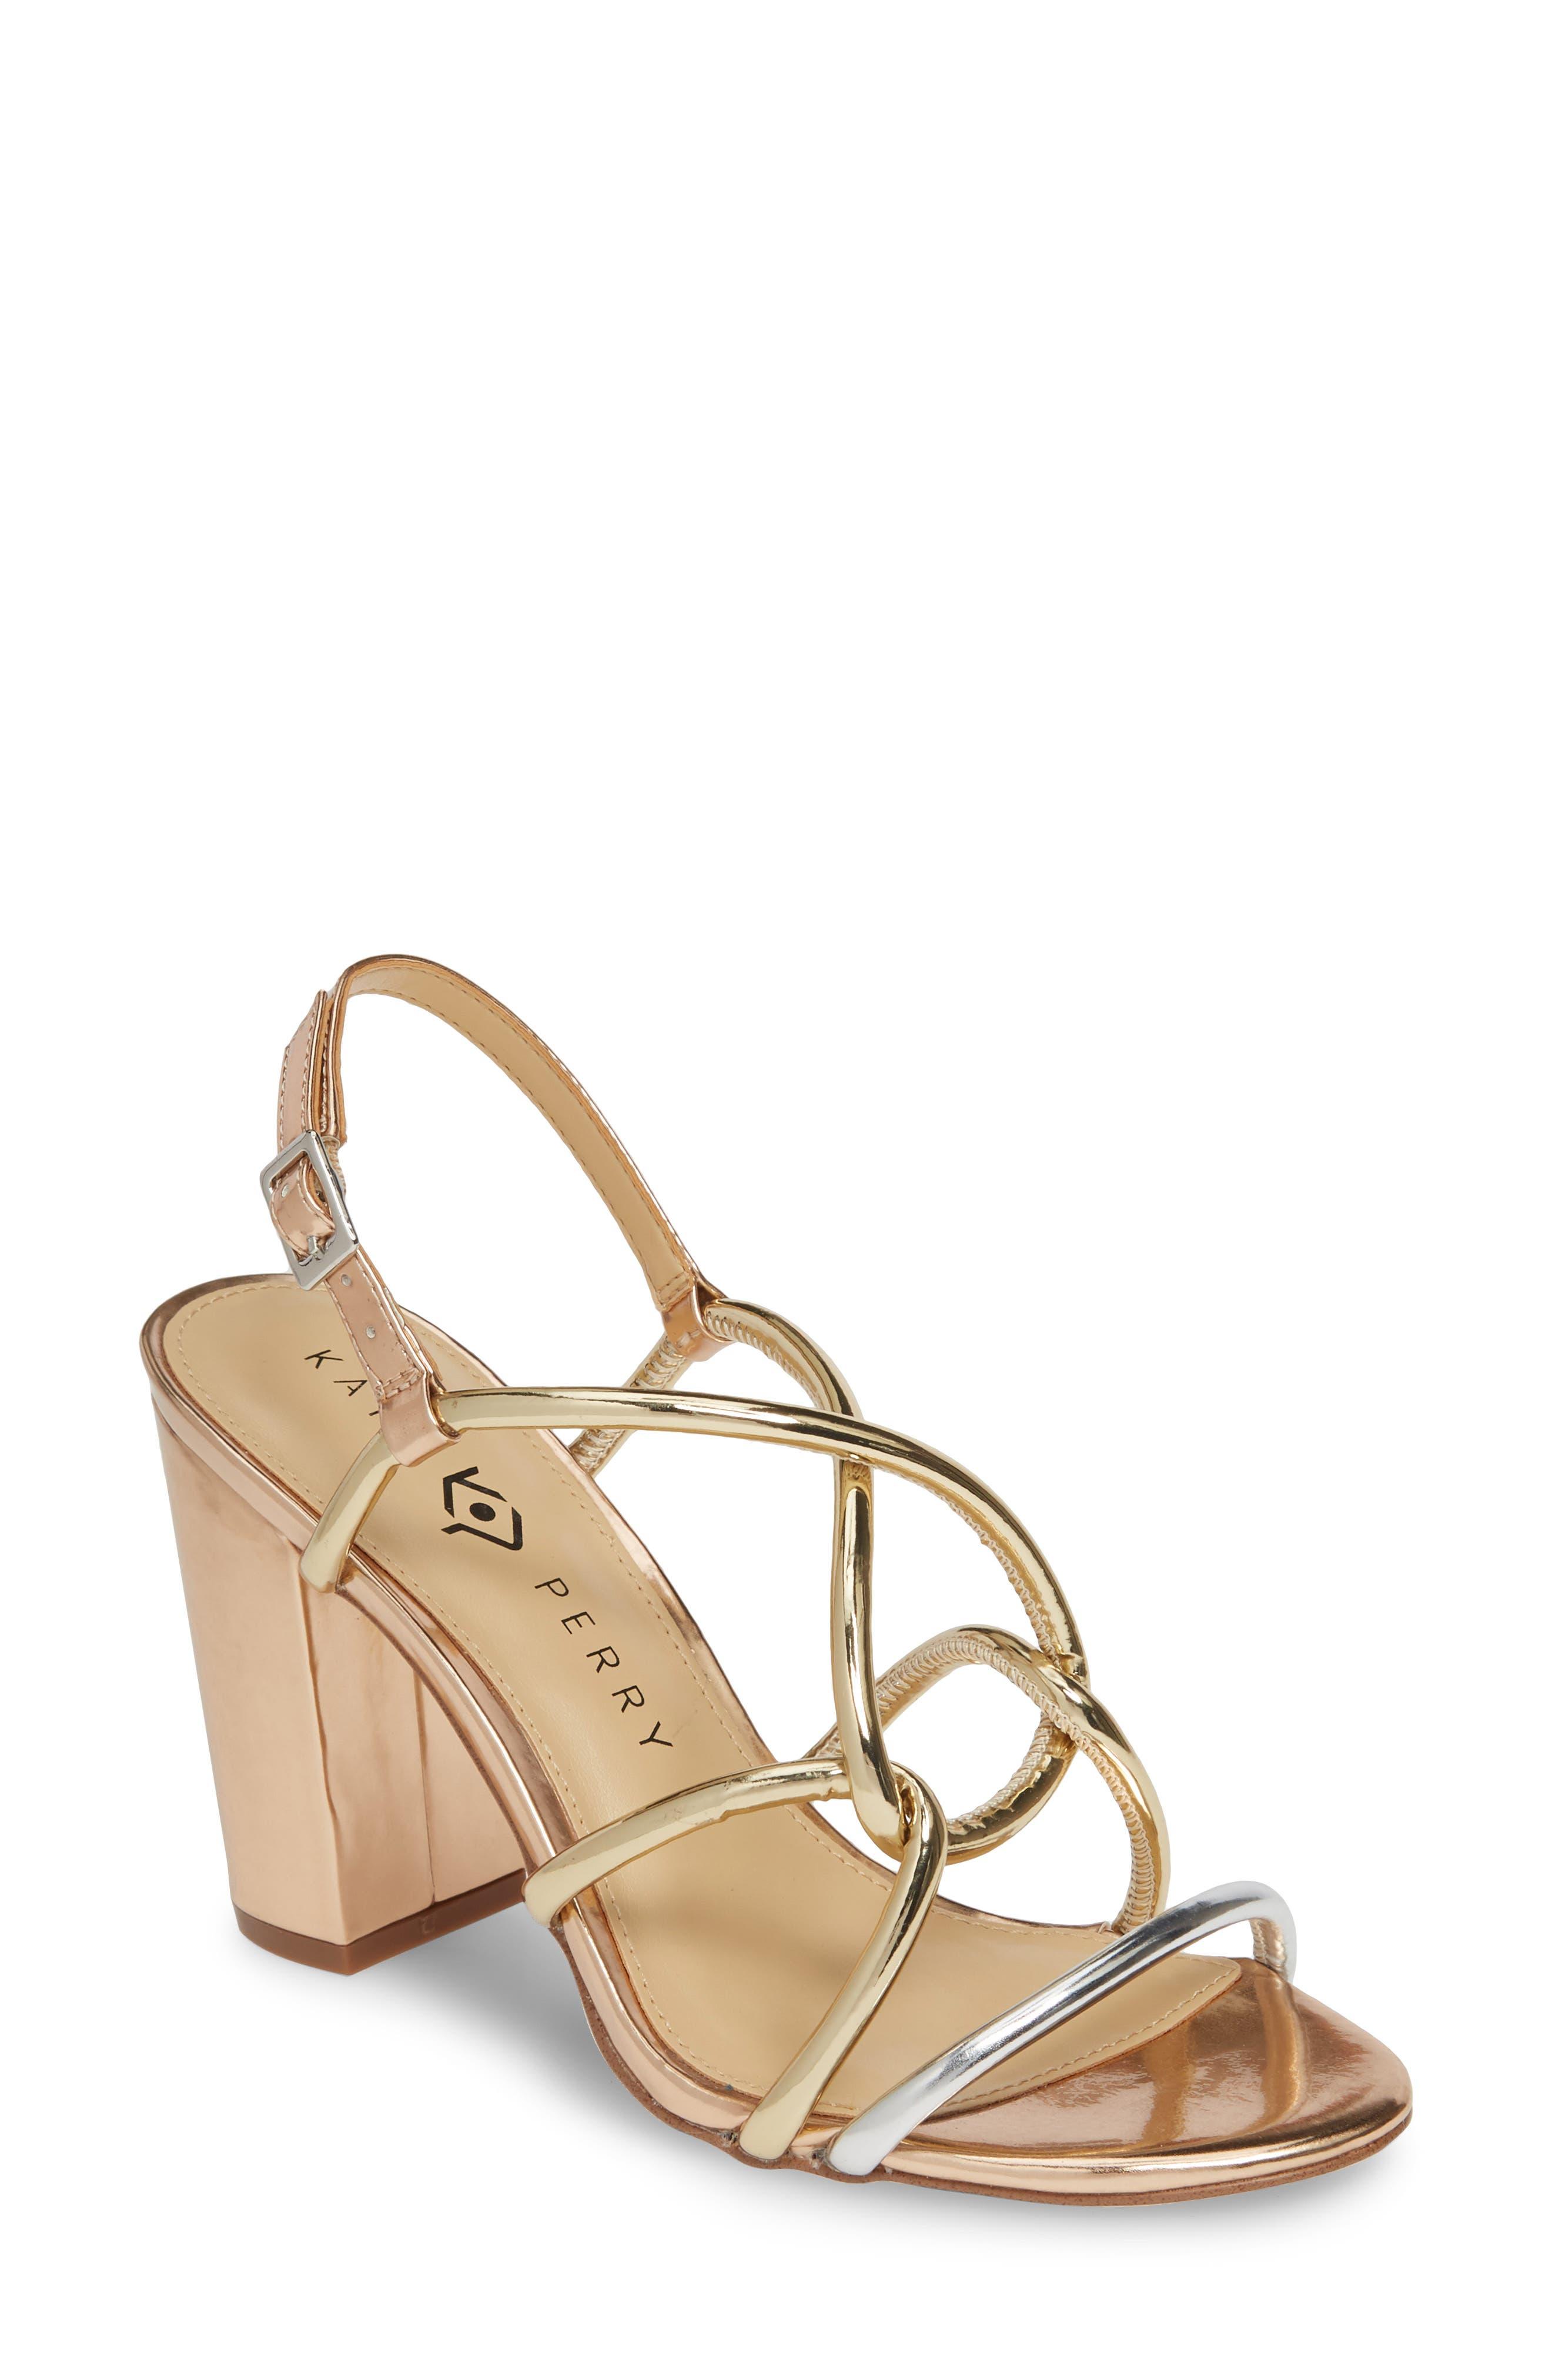 women's katy perry kendra sandal